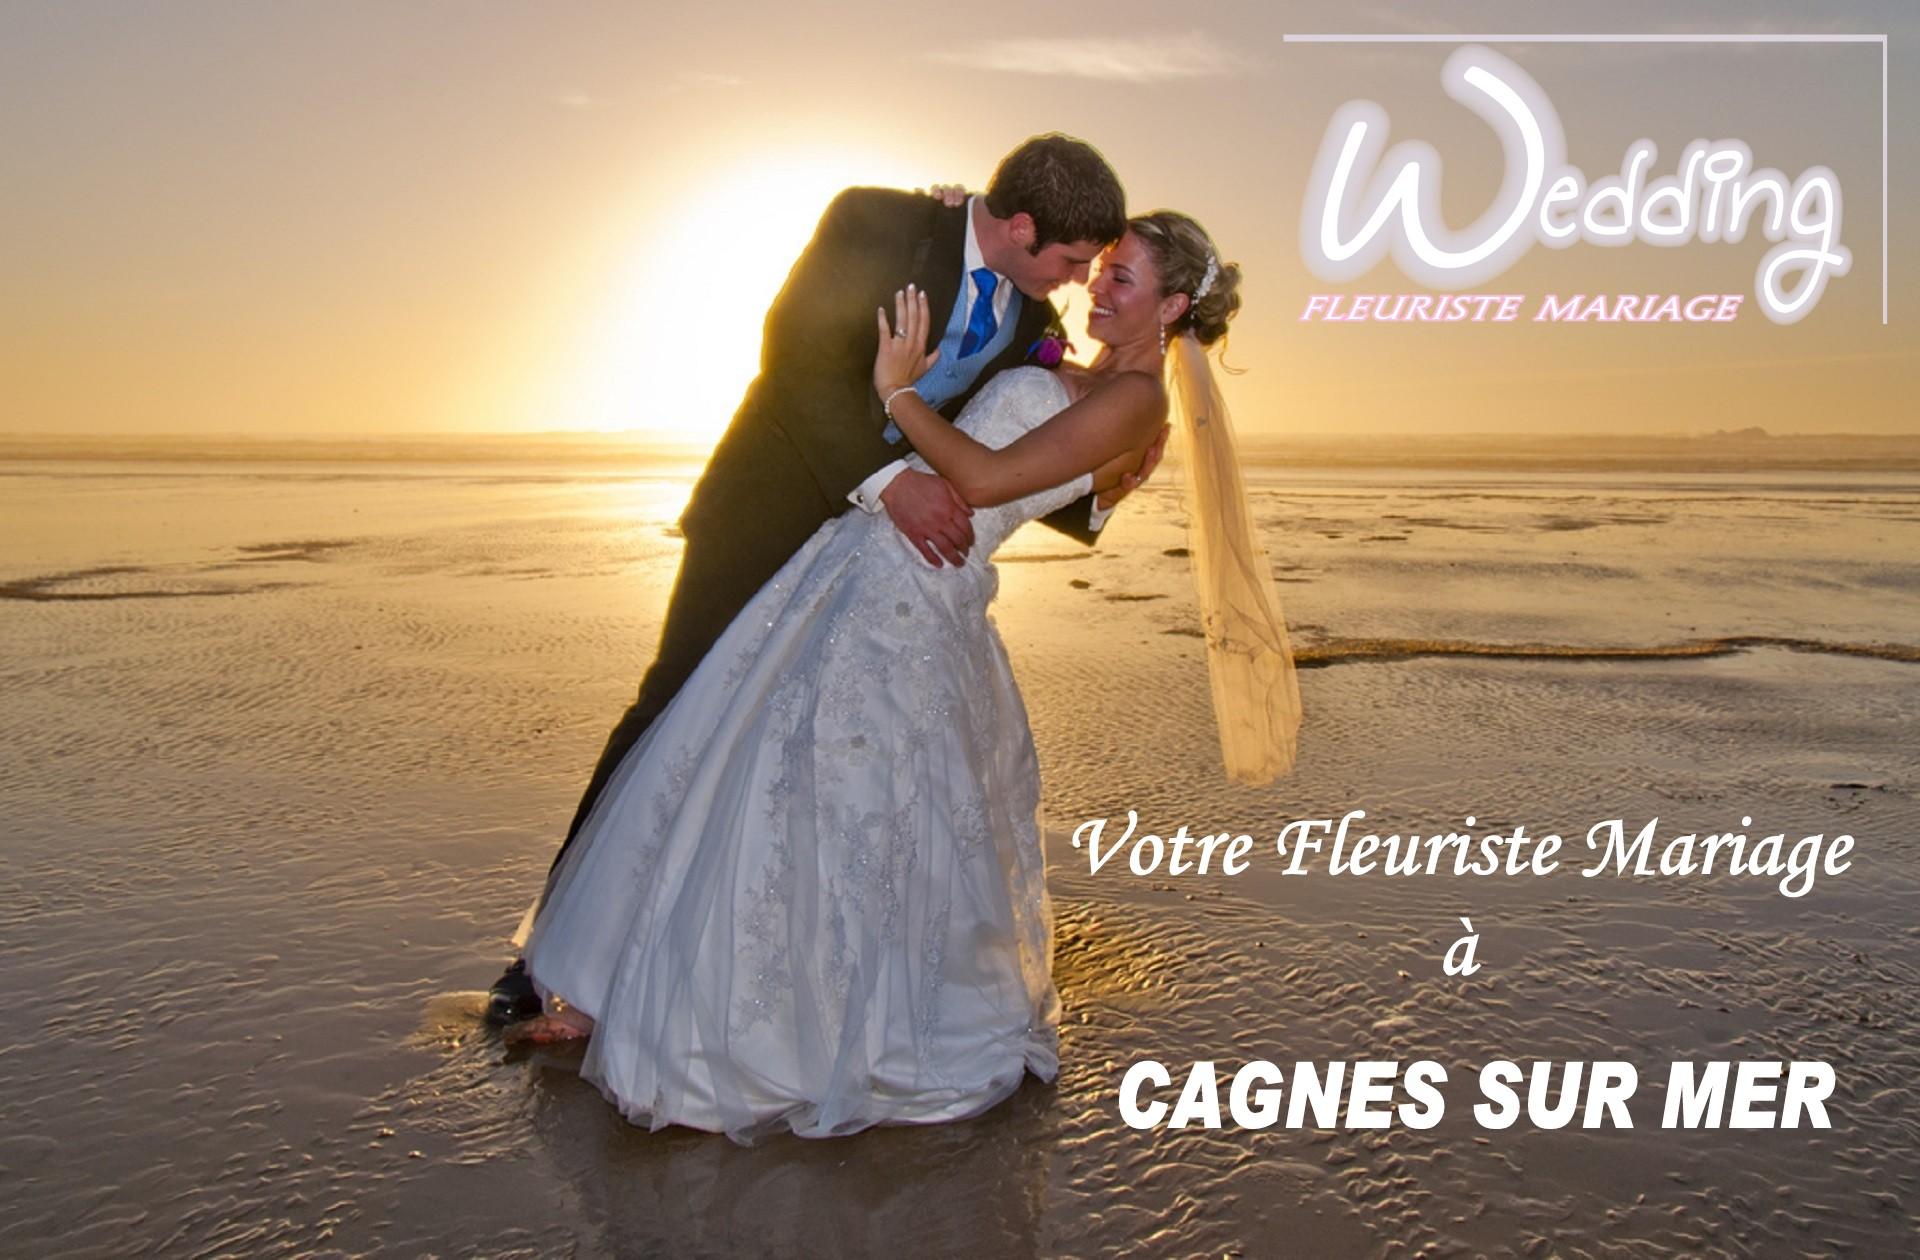 FLEURISTE MARIAGE CAGNES SUR MER - WEDDING PLANNER CAGNES SUR MER - TRAITEUR CAGNES SUR MER